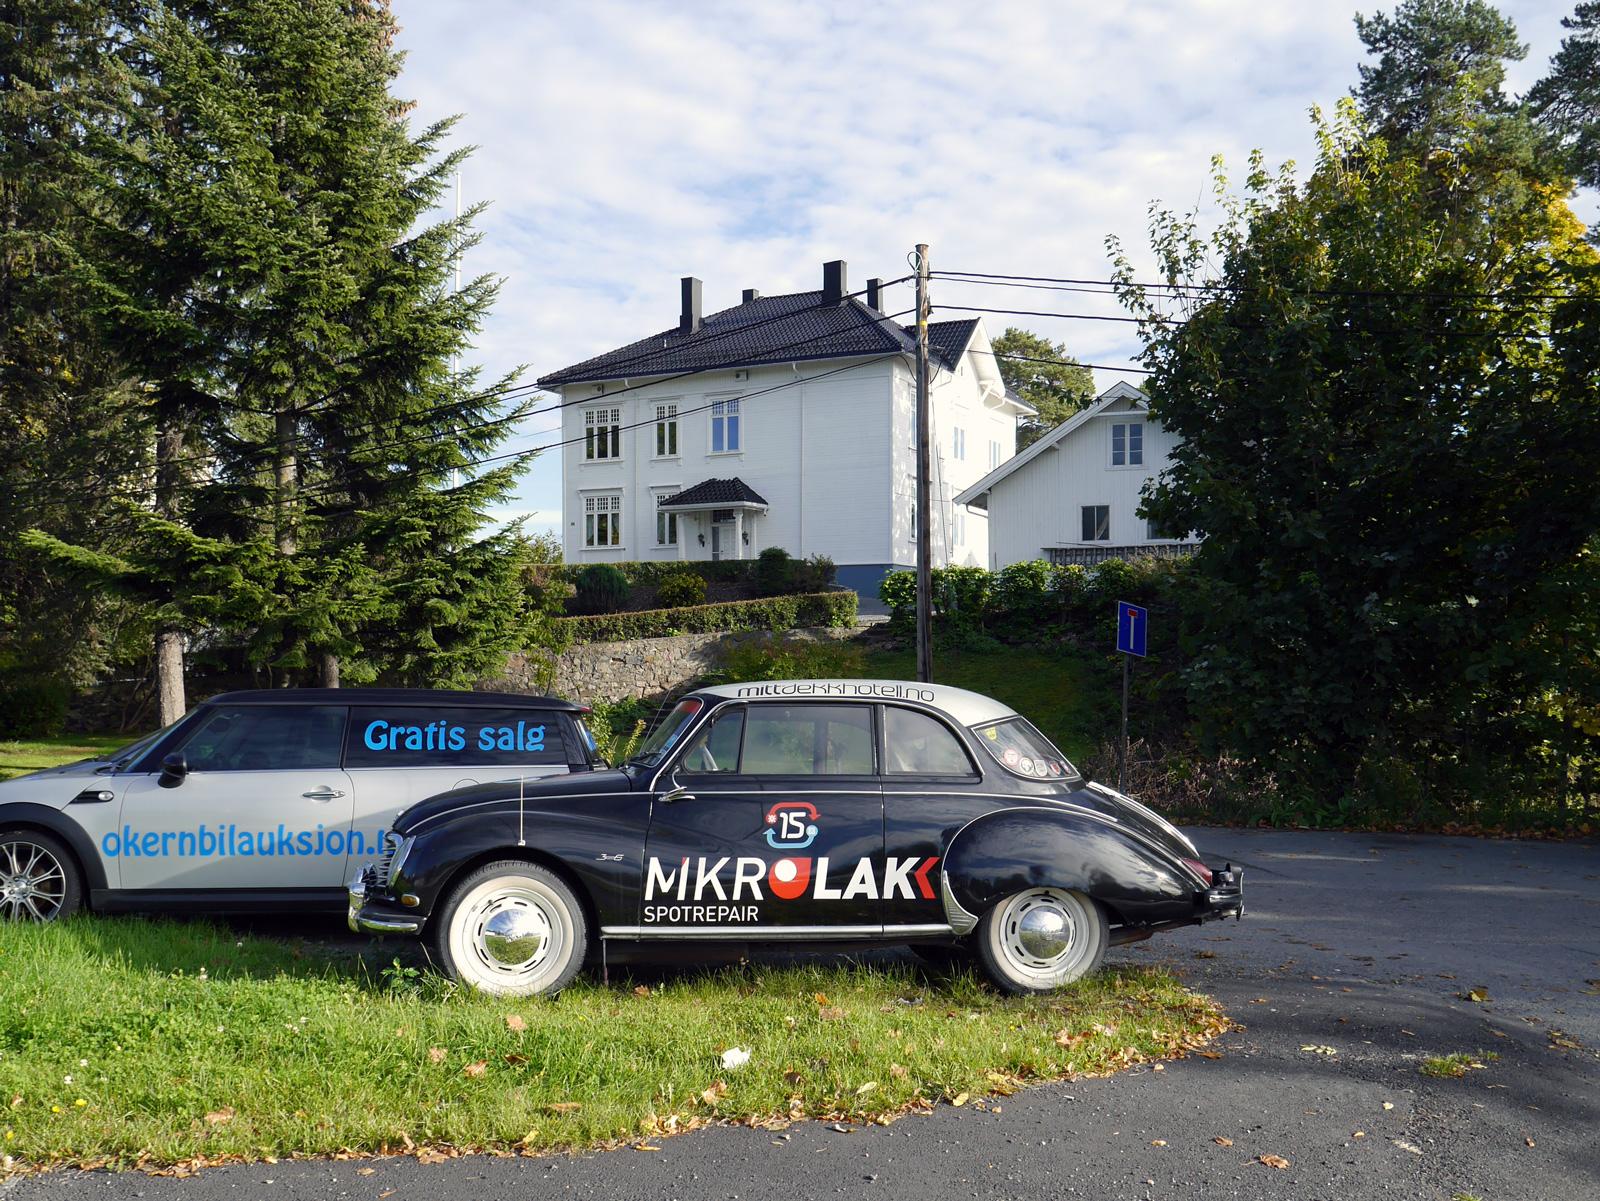 1956 Dkw 3=6 Sonderklasse F93 classic car Oslo Norway